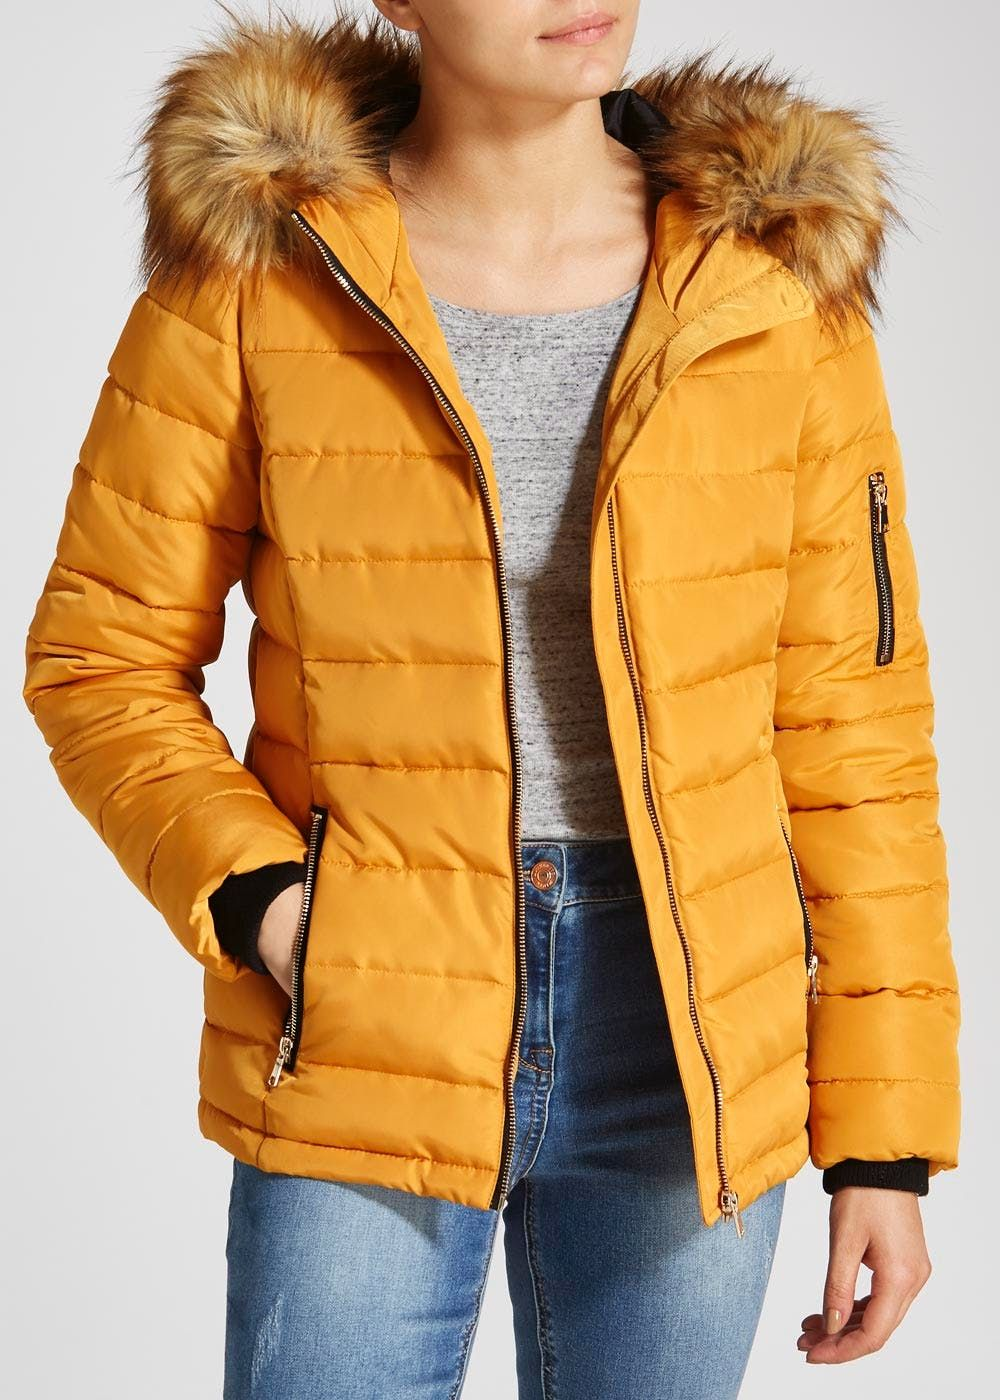 Faux Fur Hooded Short Padded Coat – Matalan | Faux fur, Short ...